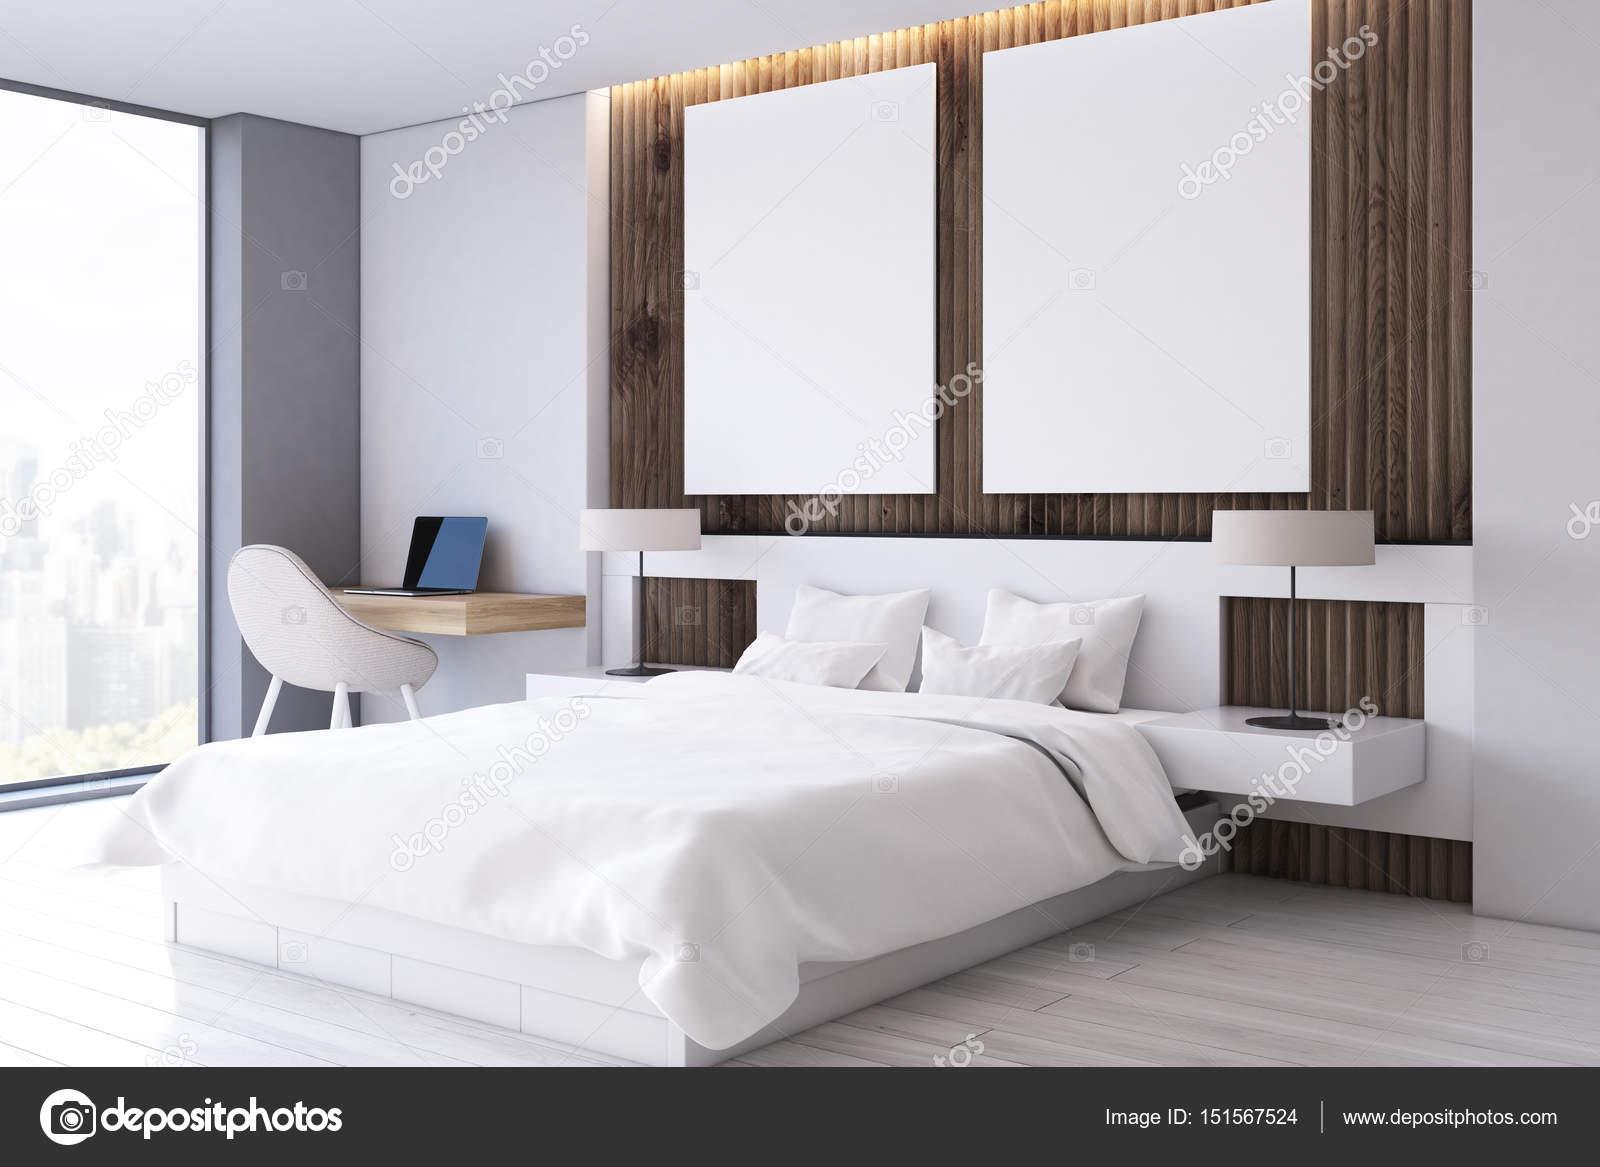 https://st3.depositphotos.com/2673929/15156/i/1600/depositphotos_151567524-stockafbeelding-twee-poster-slaapkamer-studie-kant.jpg